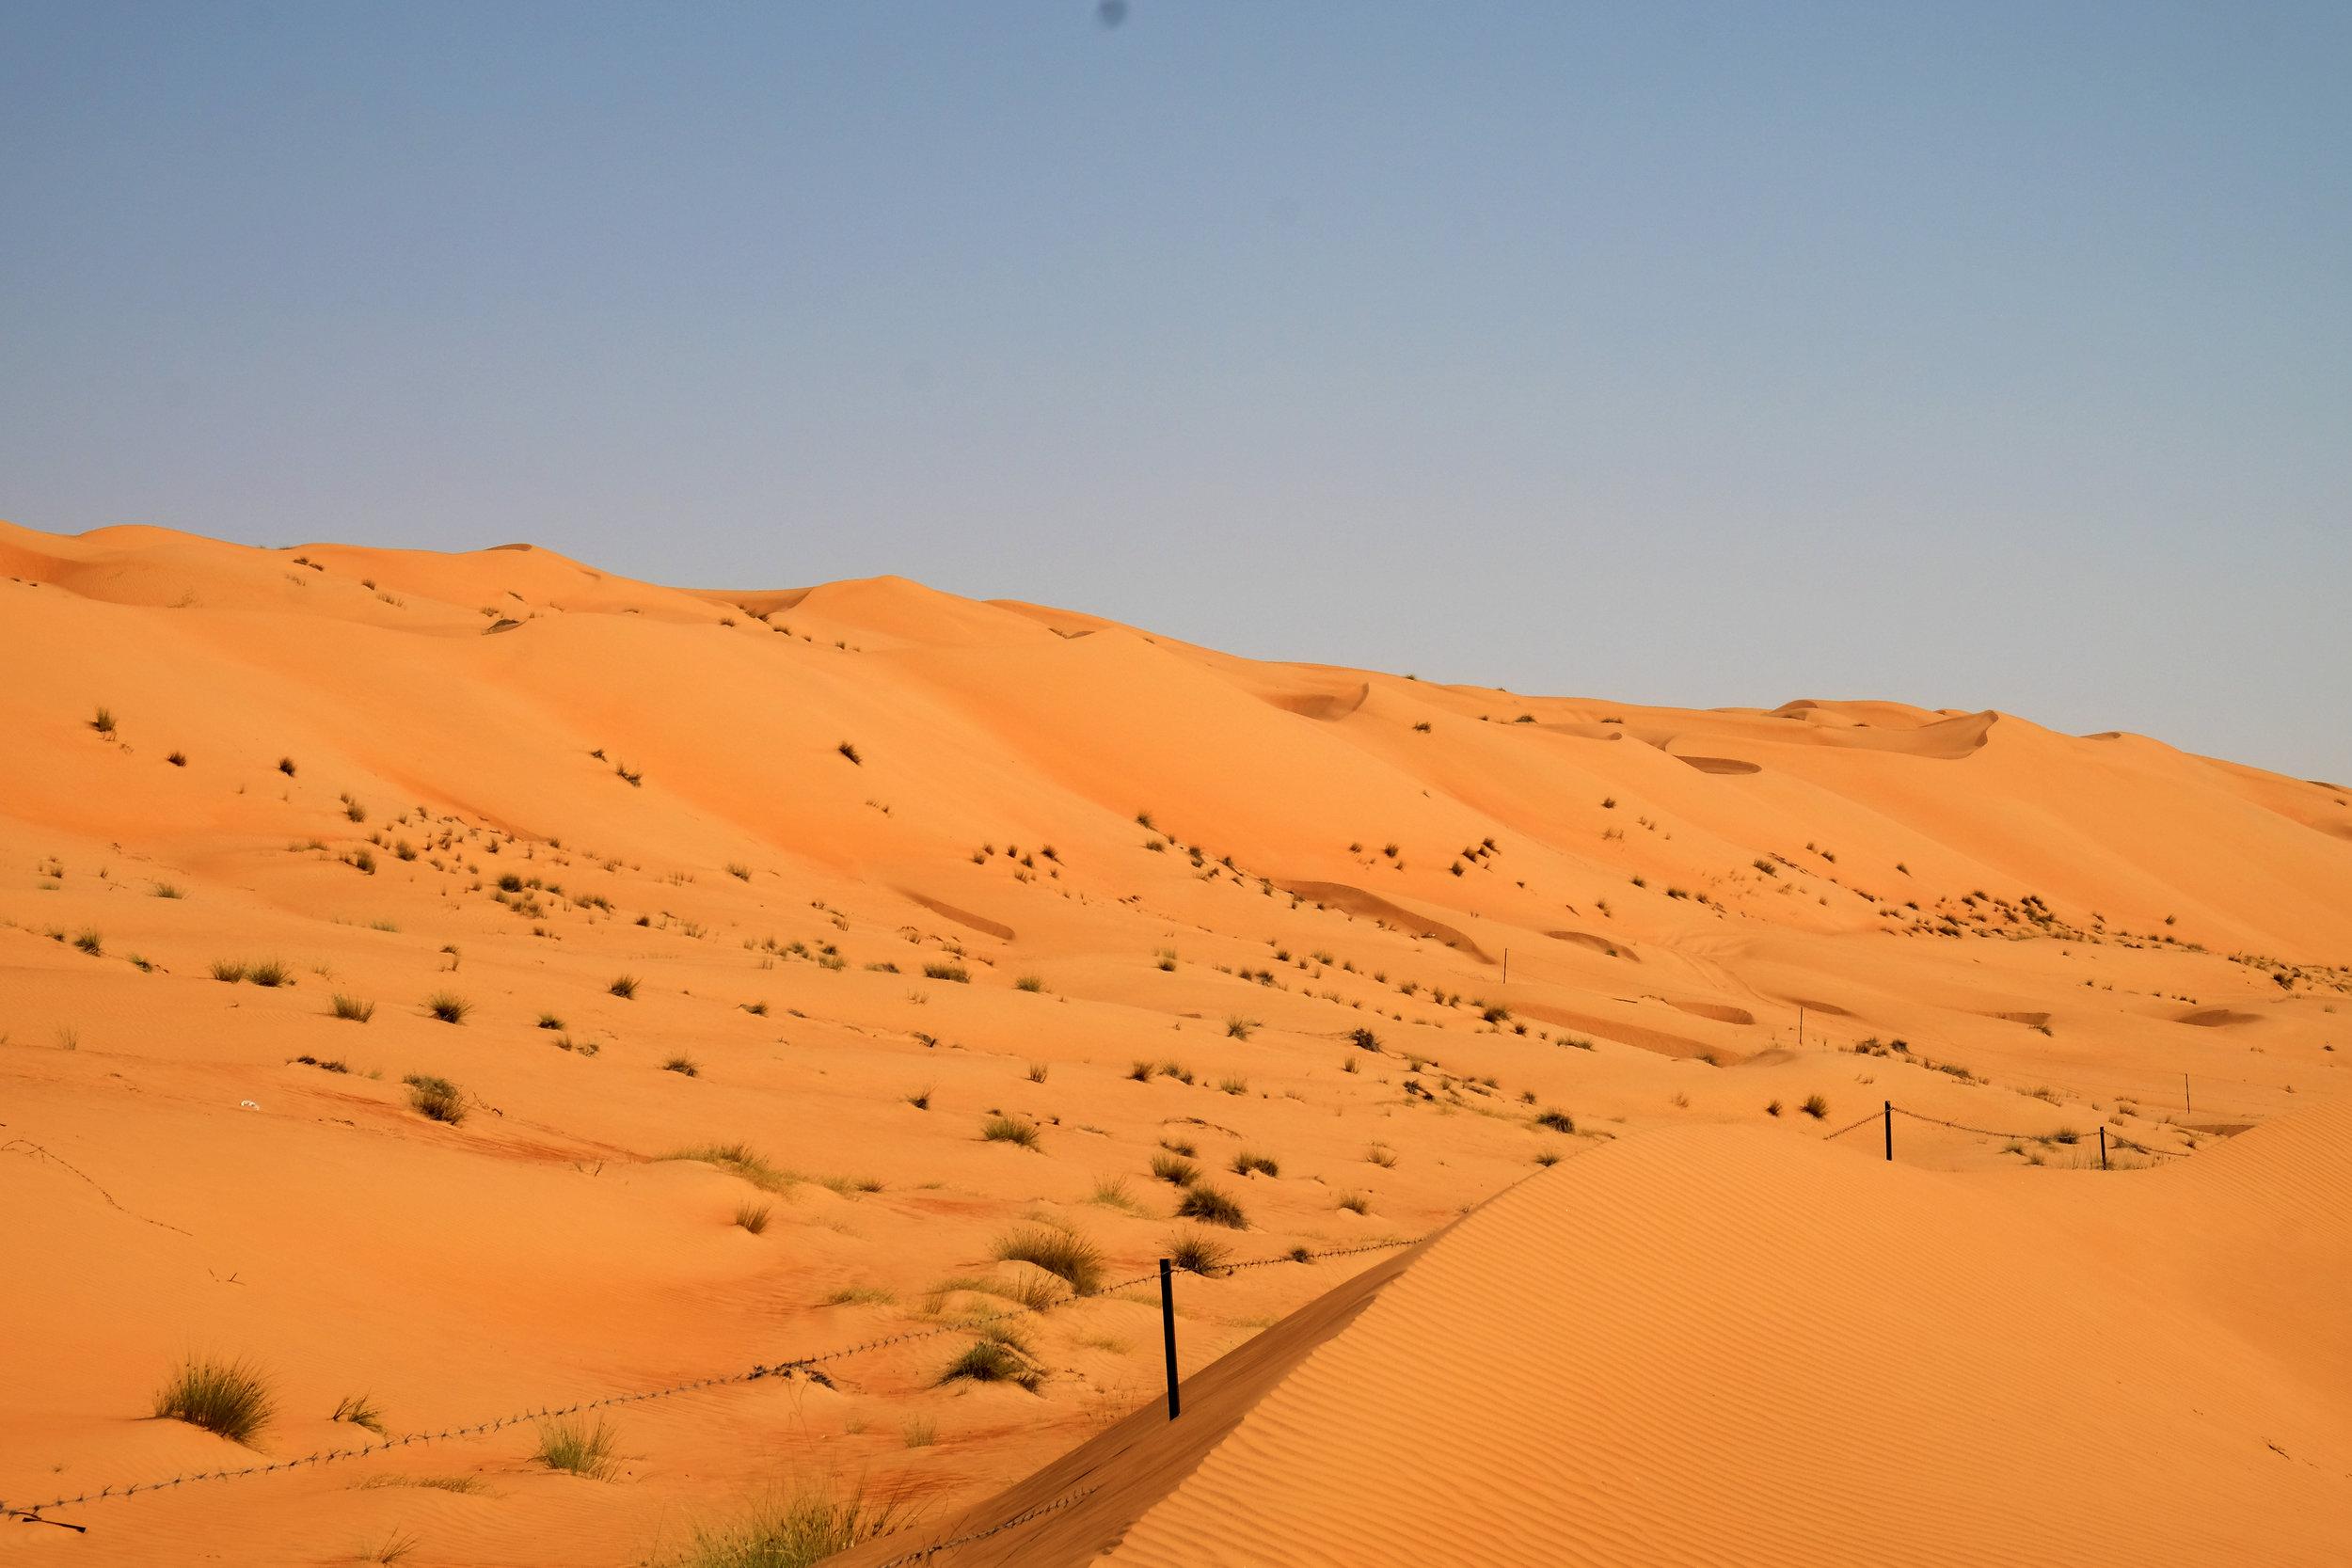 Arzucan Nur Askin    Unstoppable (March 2018, Wahiba Sands Desert, Oman)